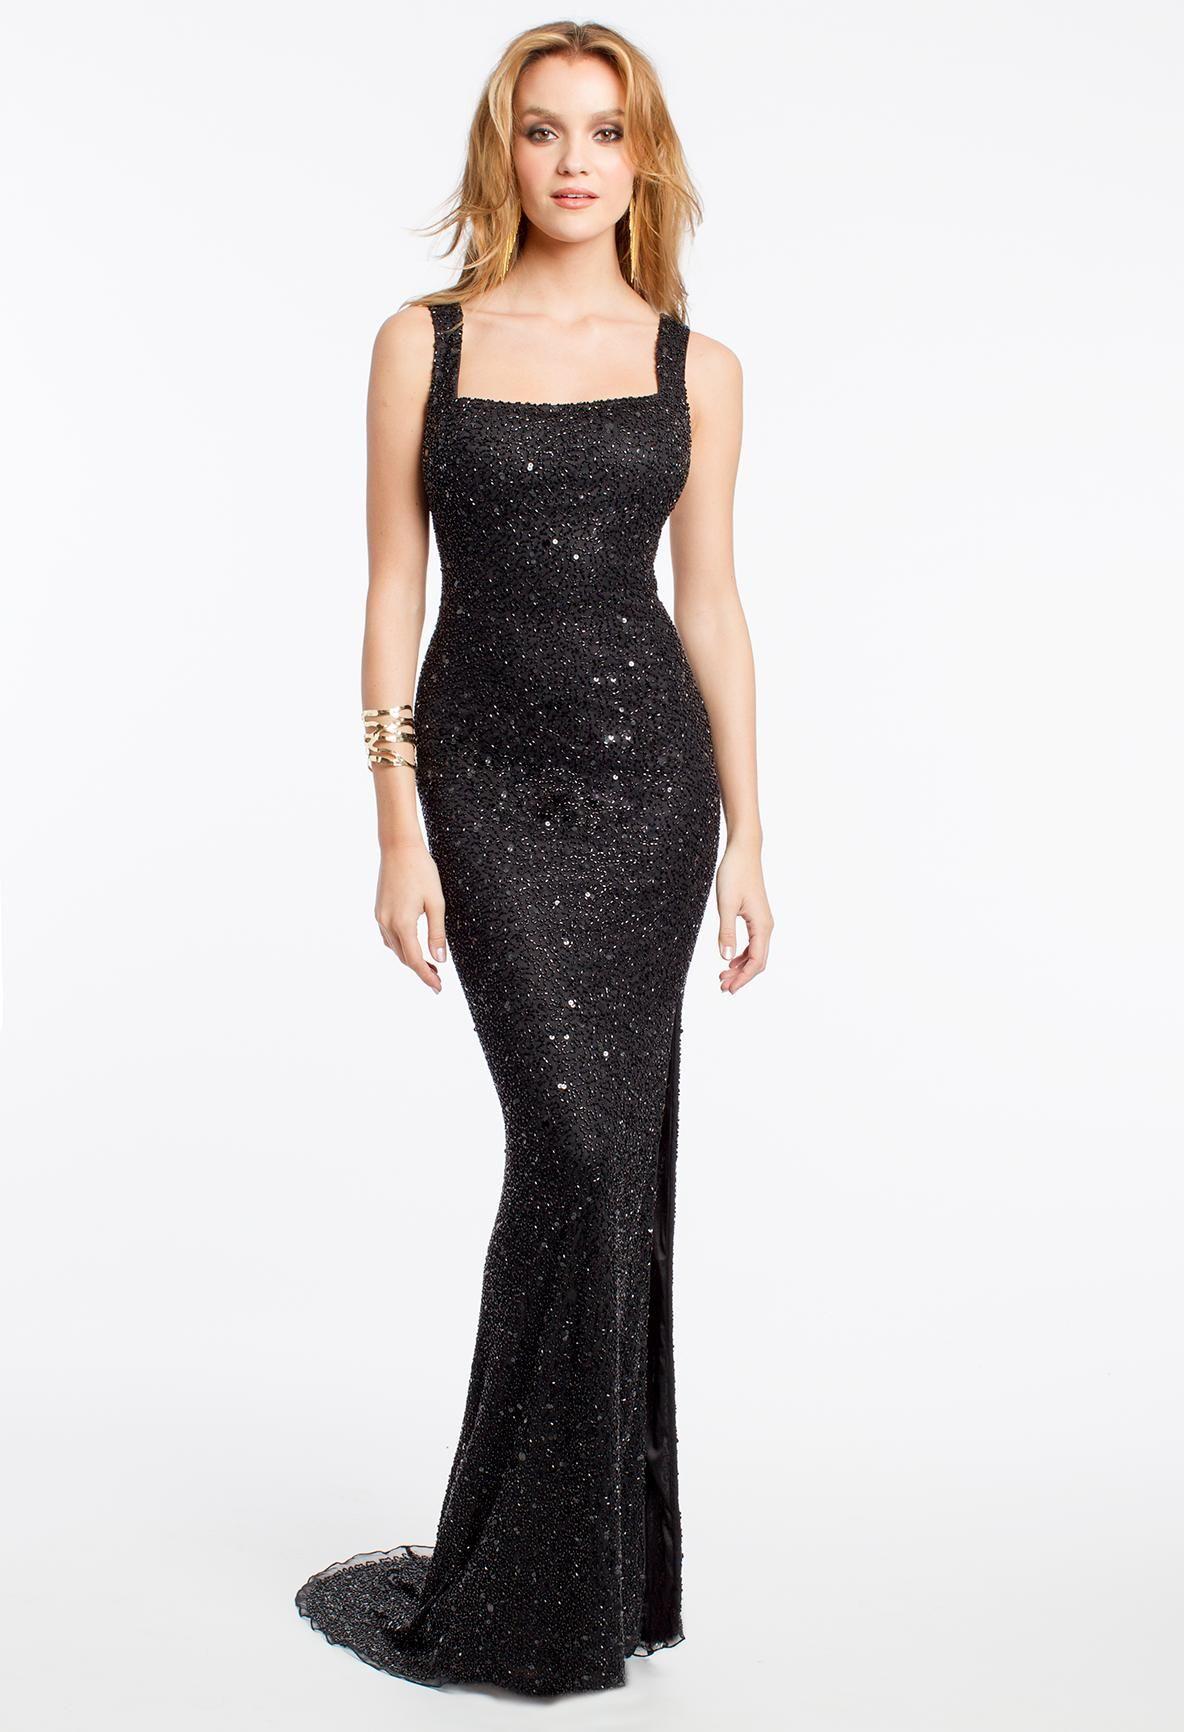 camillelavie #groupusa #longdresses #sparkle #blackdresses | HOLIDAY ...